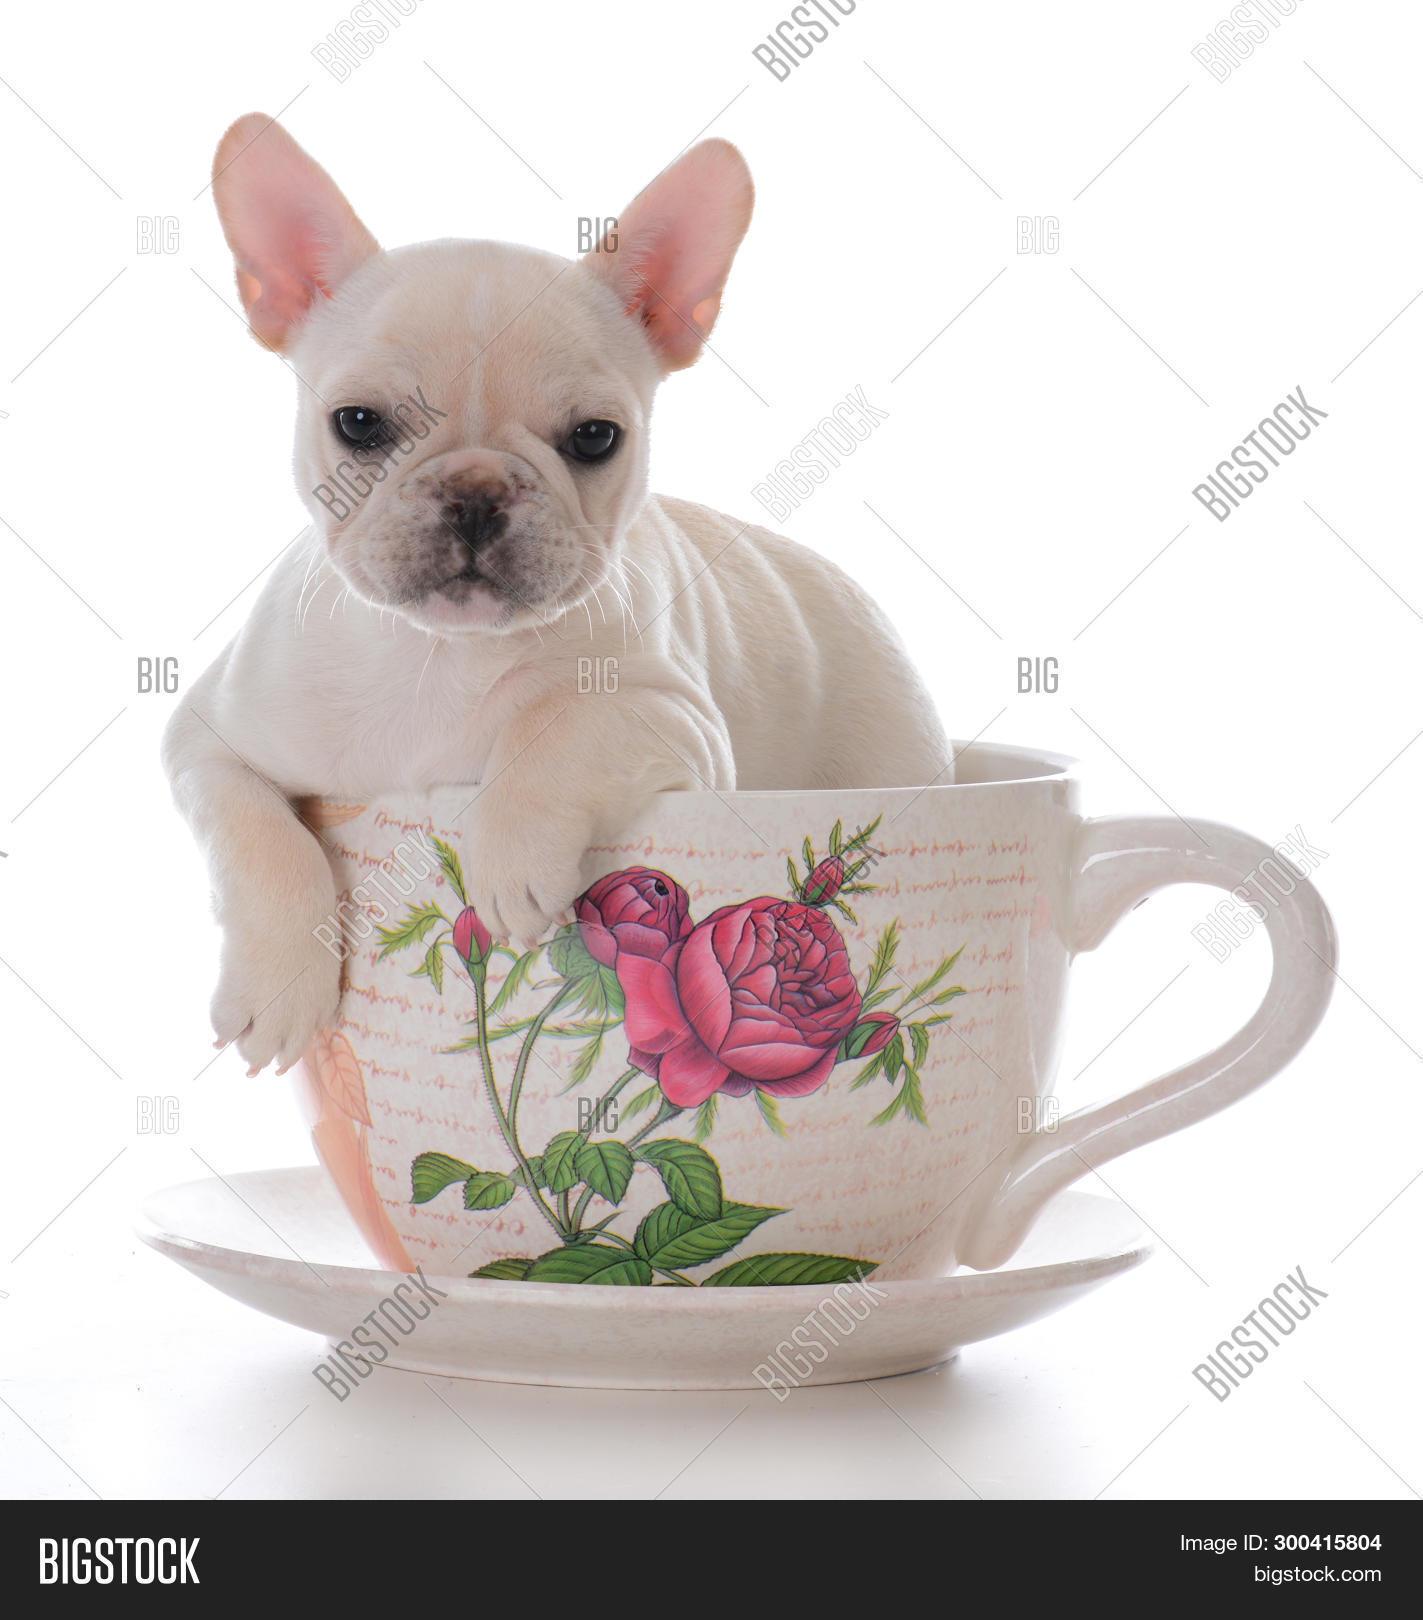 Female French Bulldog Image & Photo (Free Trial) | Bigstock